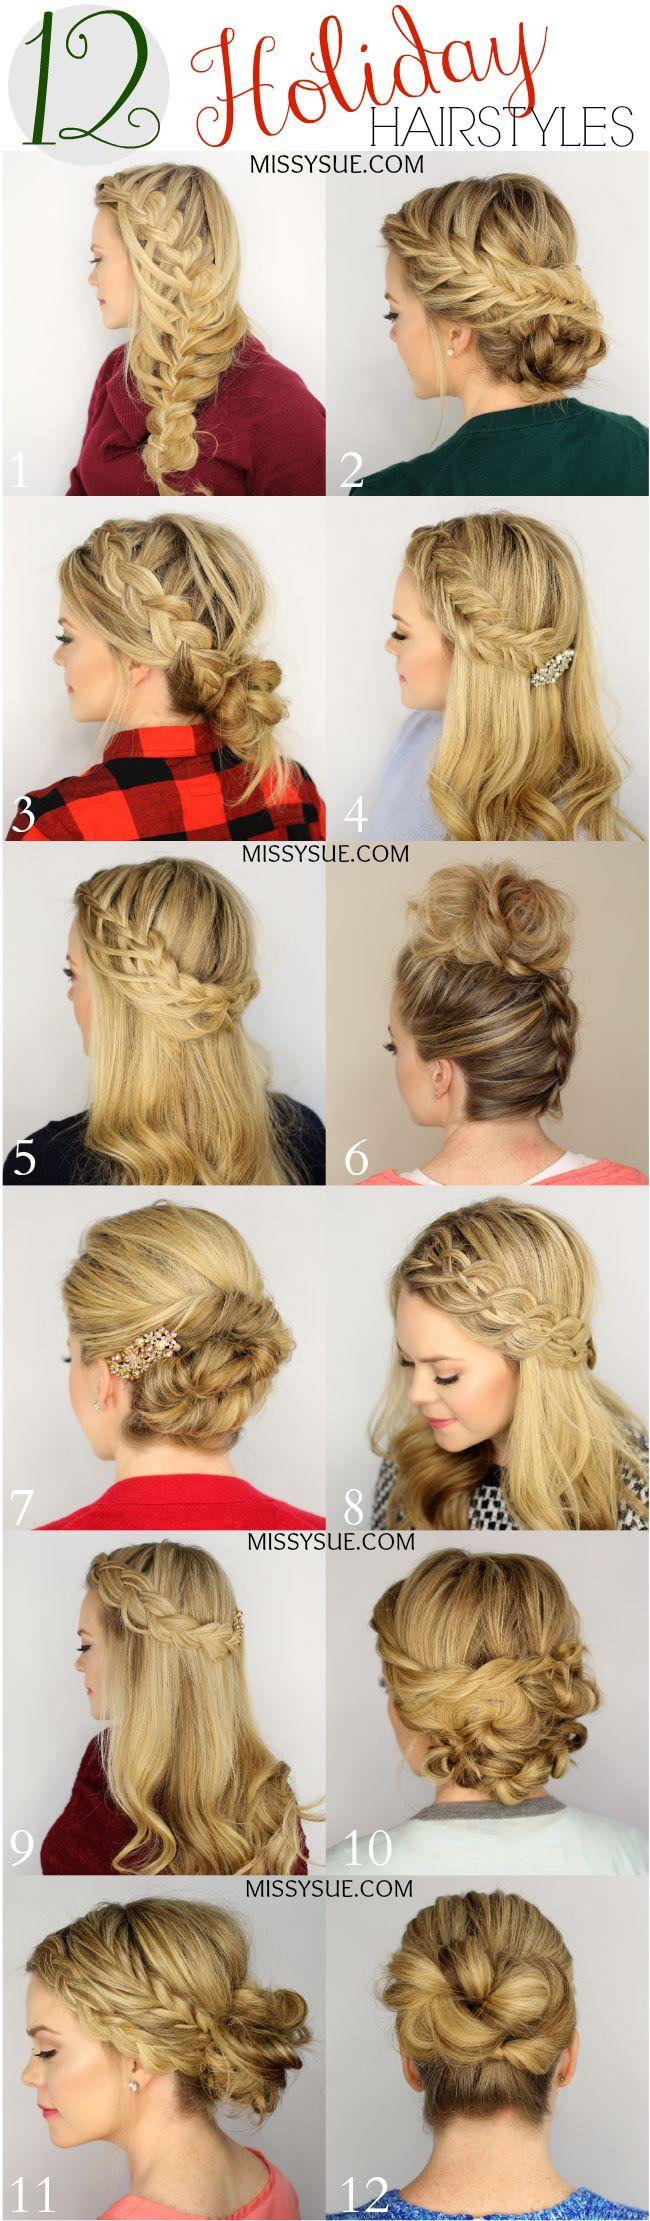 Прически с косами инструкциями